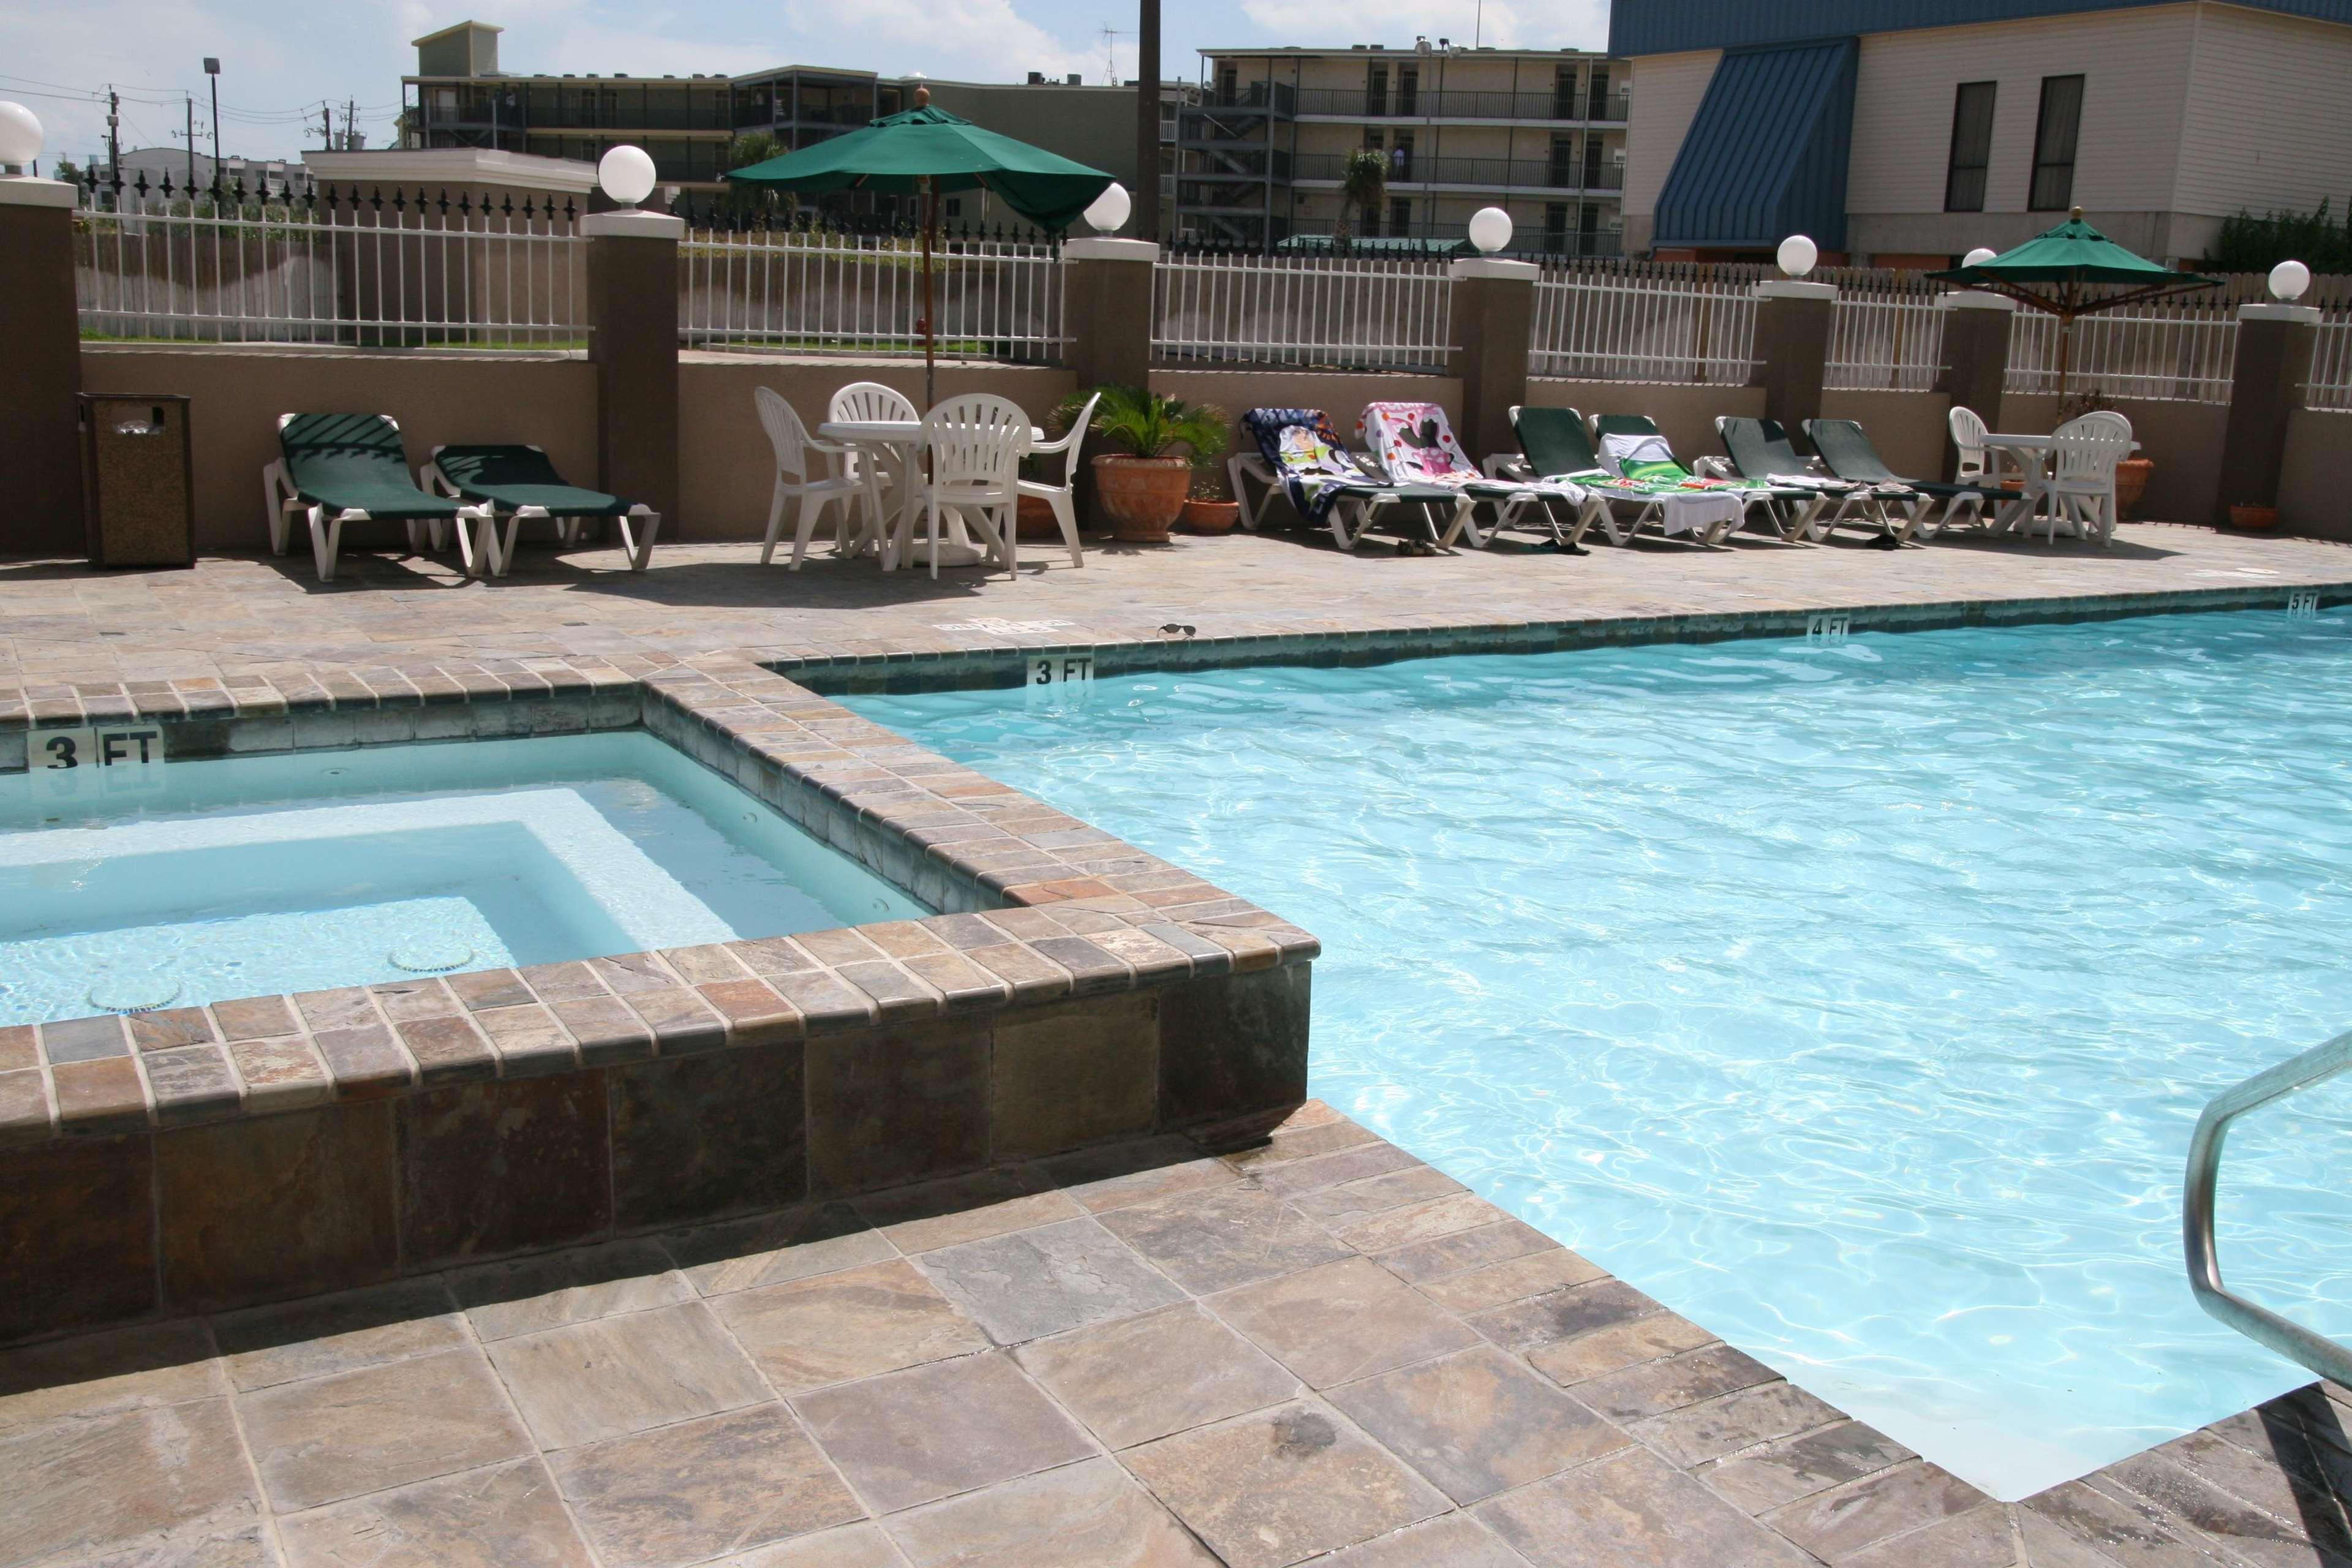 Hampton Inn & Suites Galveston image 10